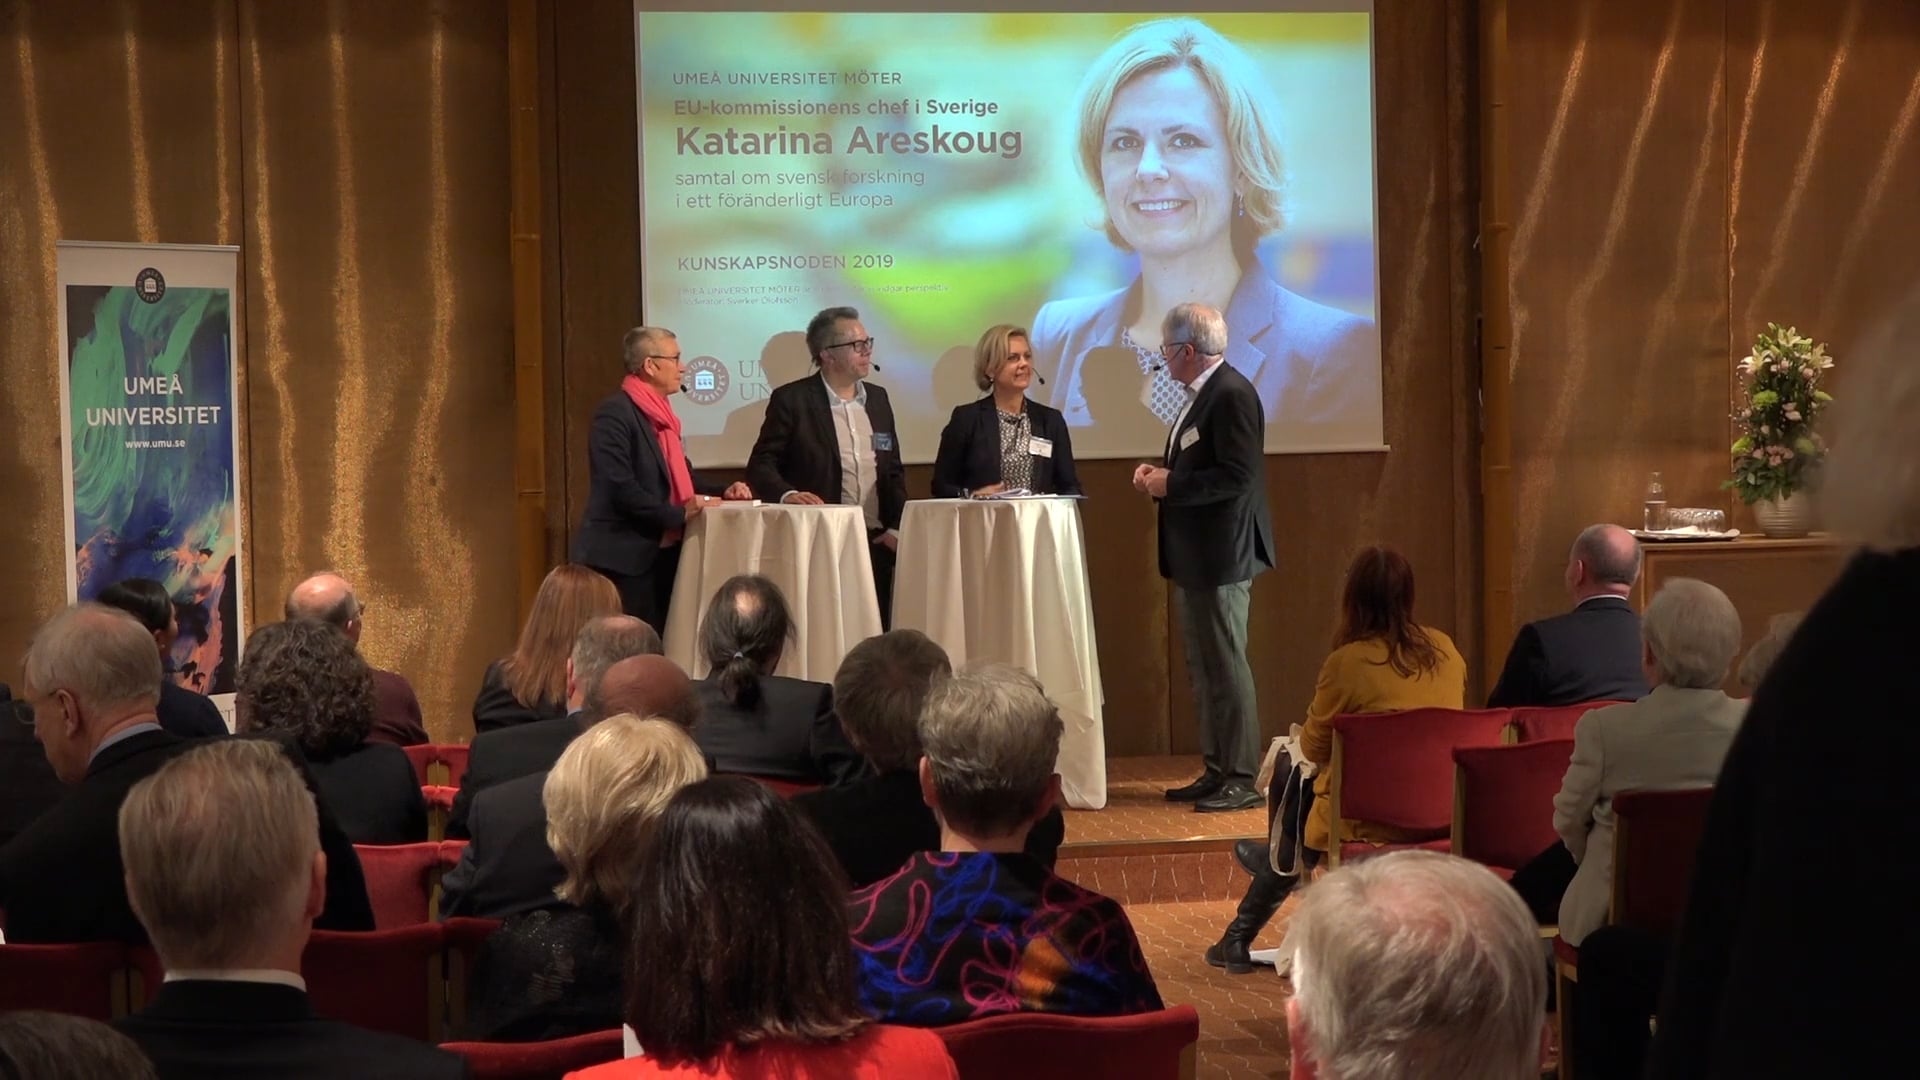 Film: Katarina Areskoug, EU-kommissionens chef i Sverige